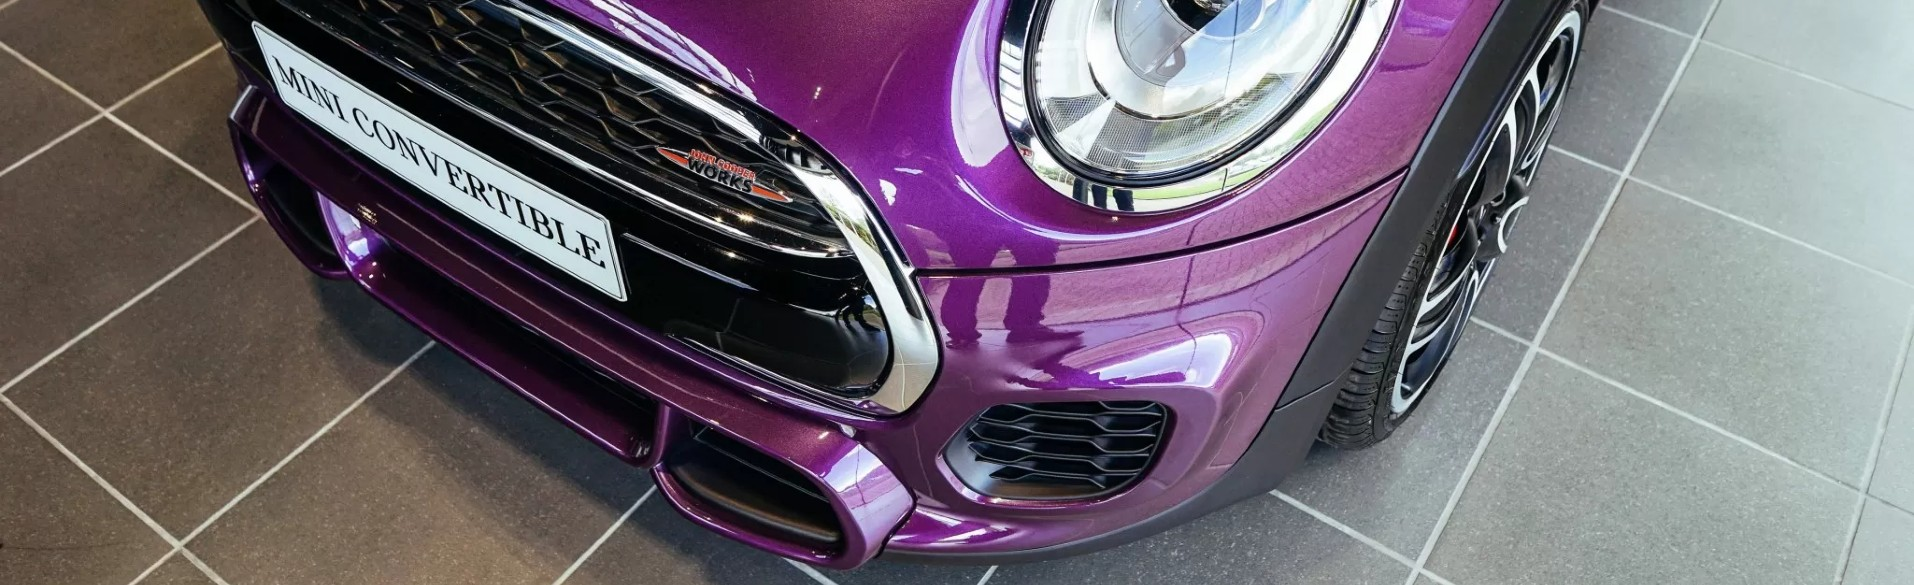 Purple Silk MINI JCW Convertible